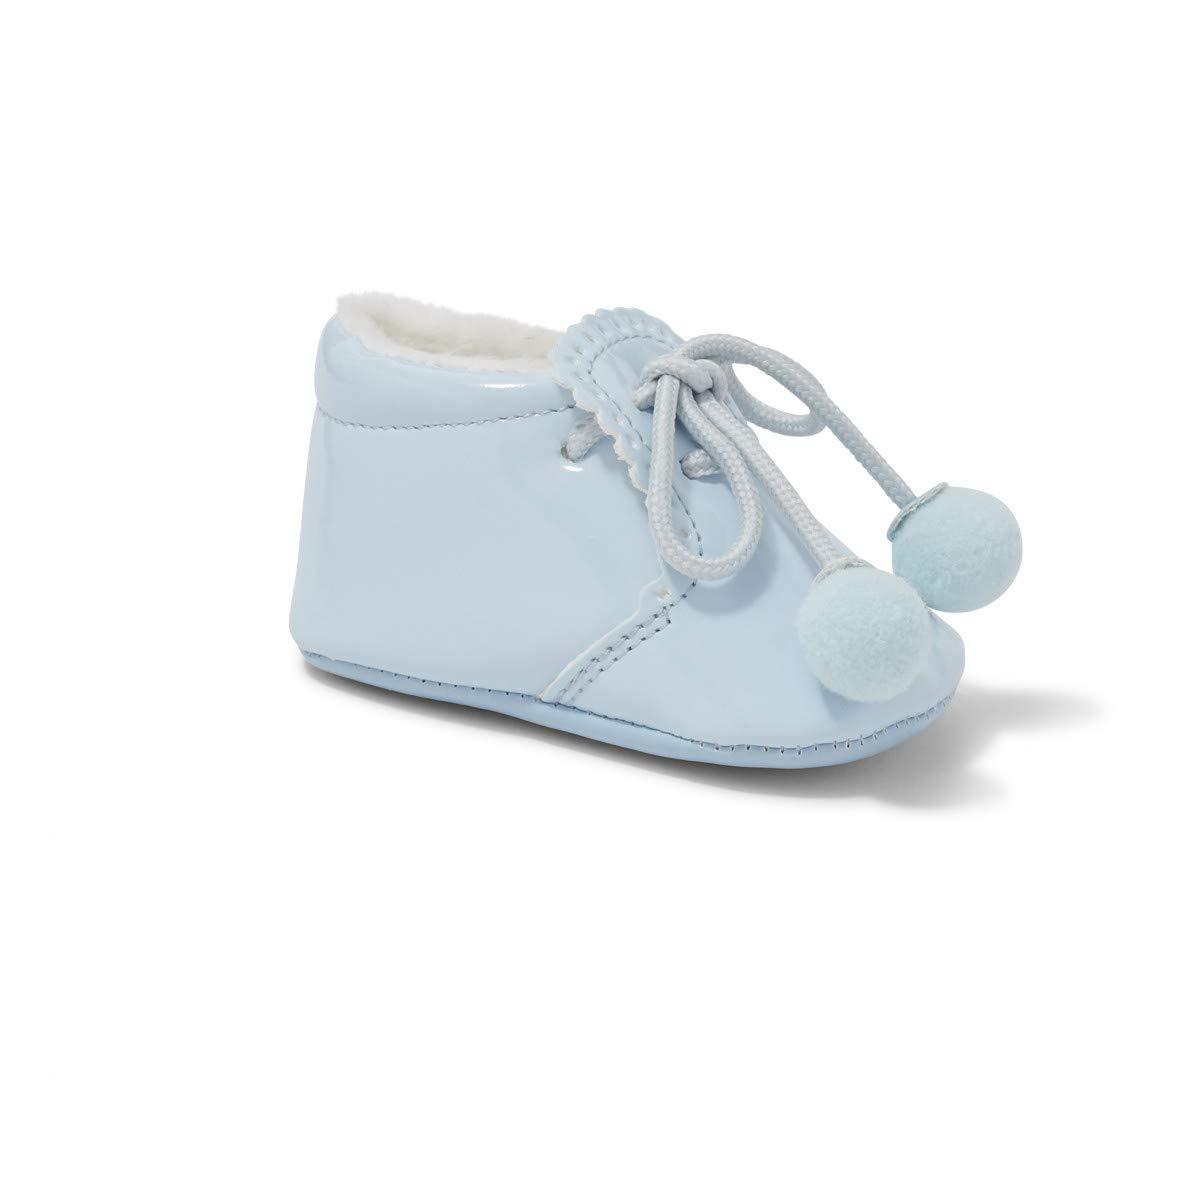 BNIB Mary Jane style patent diamante infant girls shoes